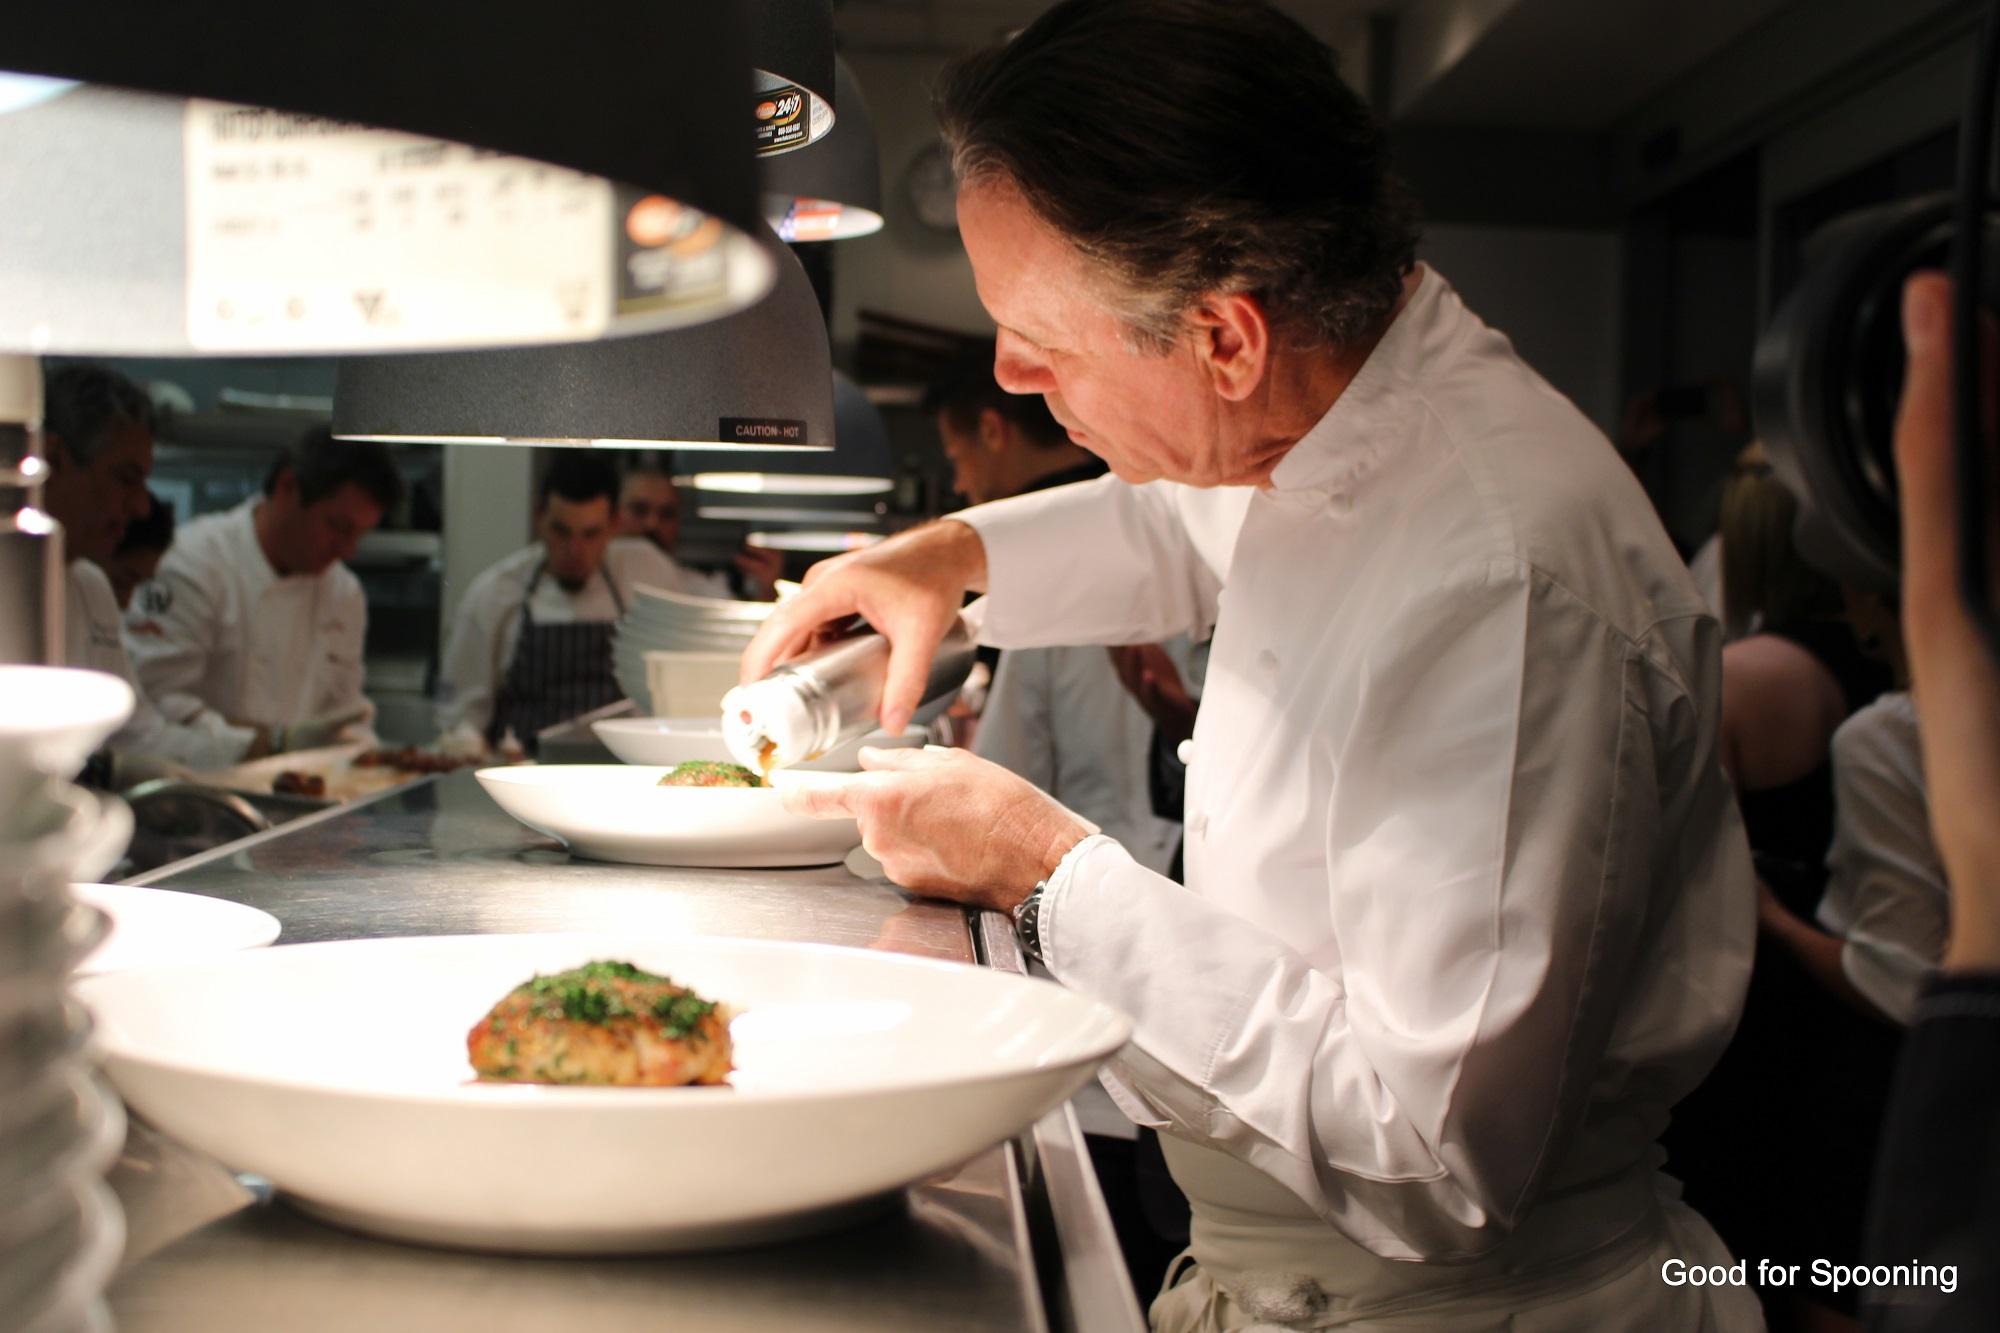 Chef Thomas Keller working his magic.